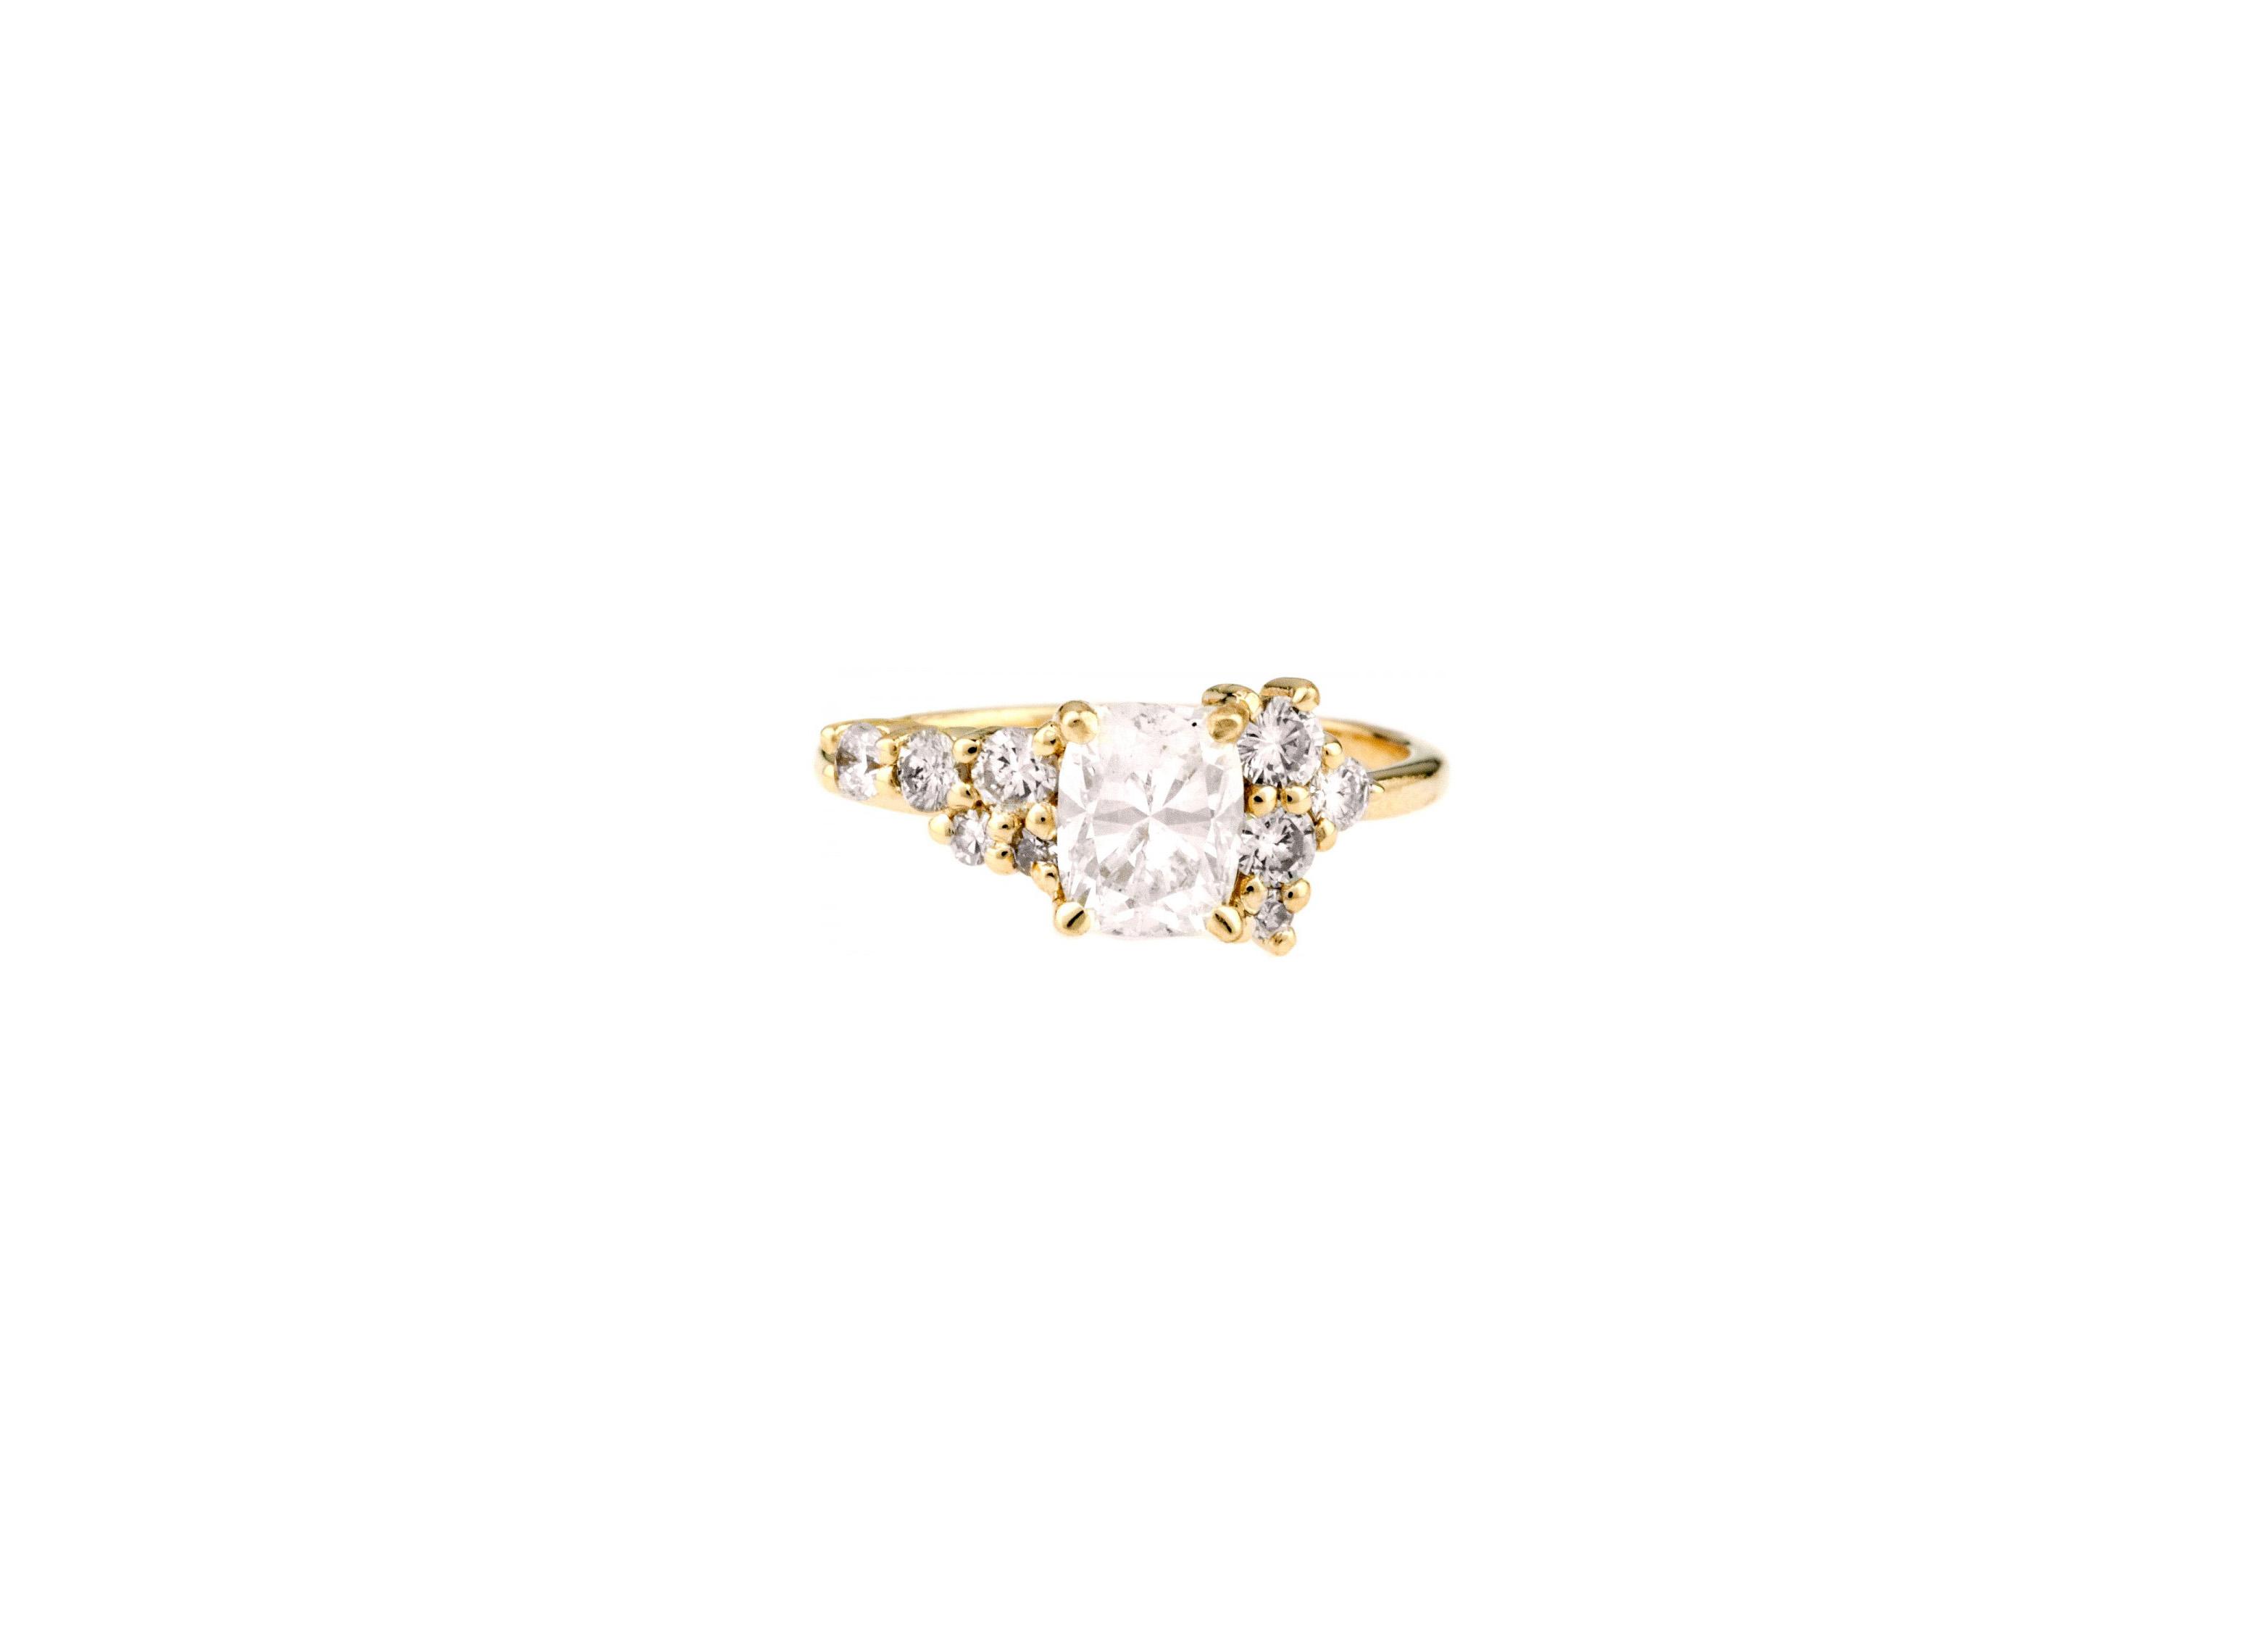 bario neal custom heirloom cushion cut diamond cluster engagement ring